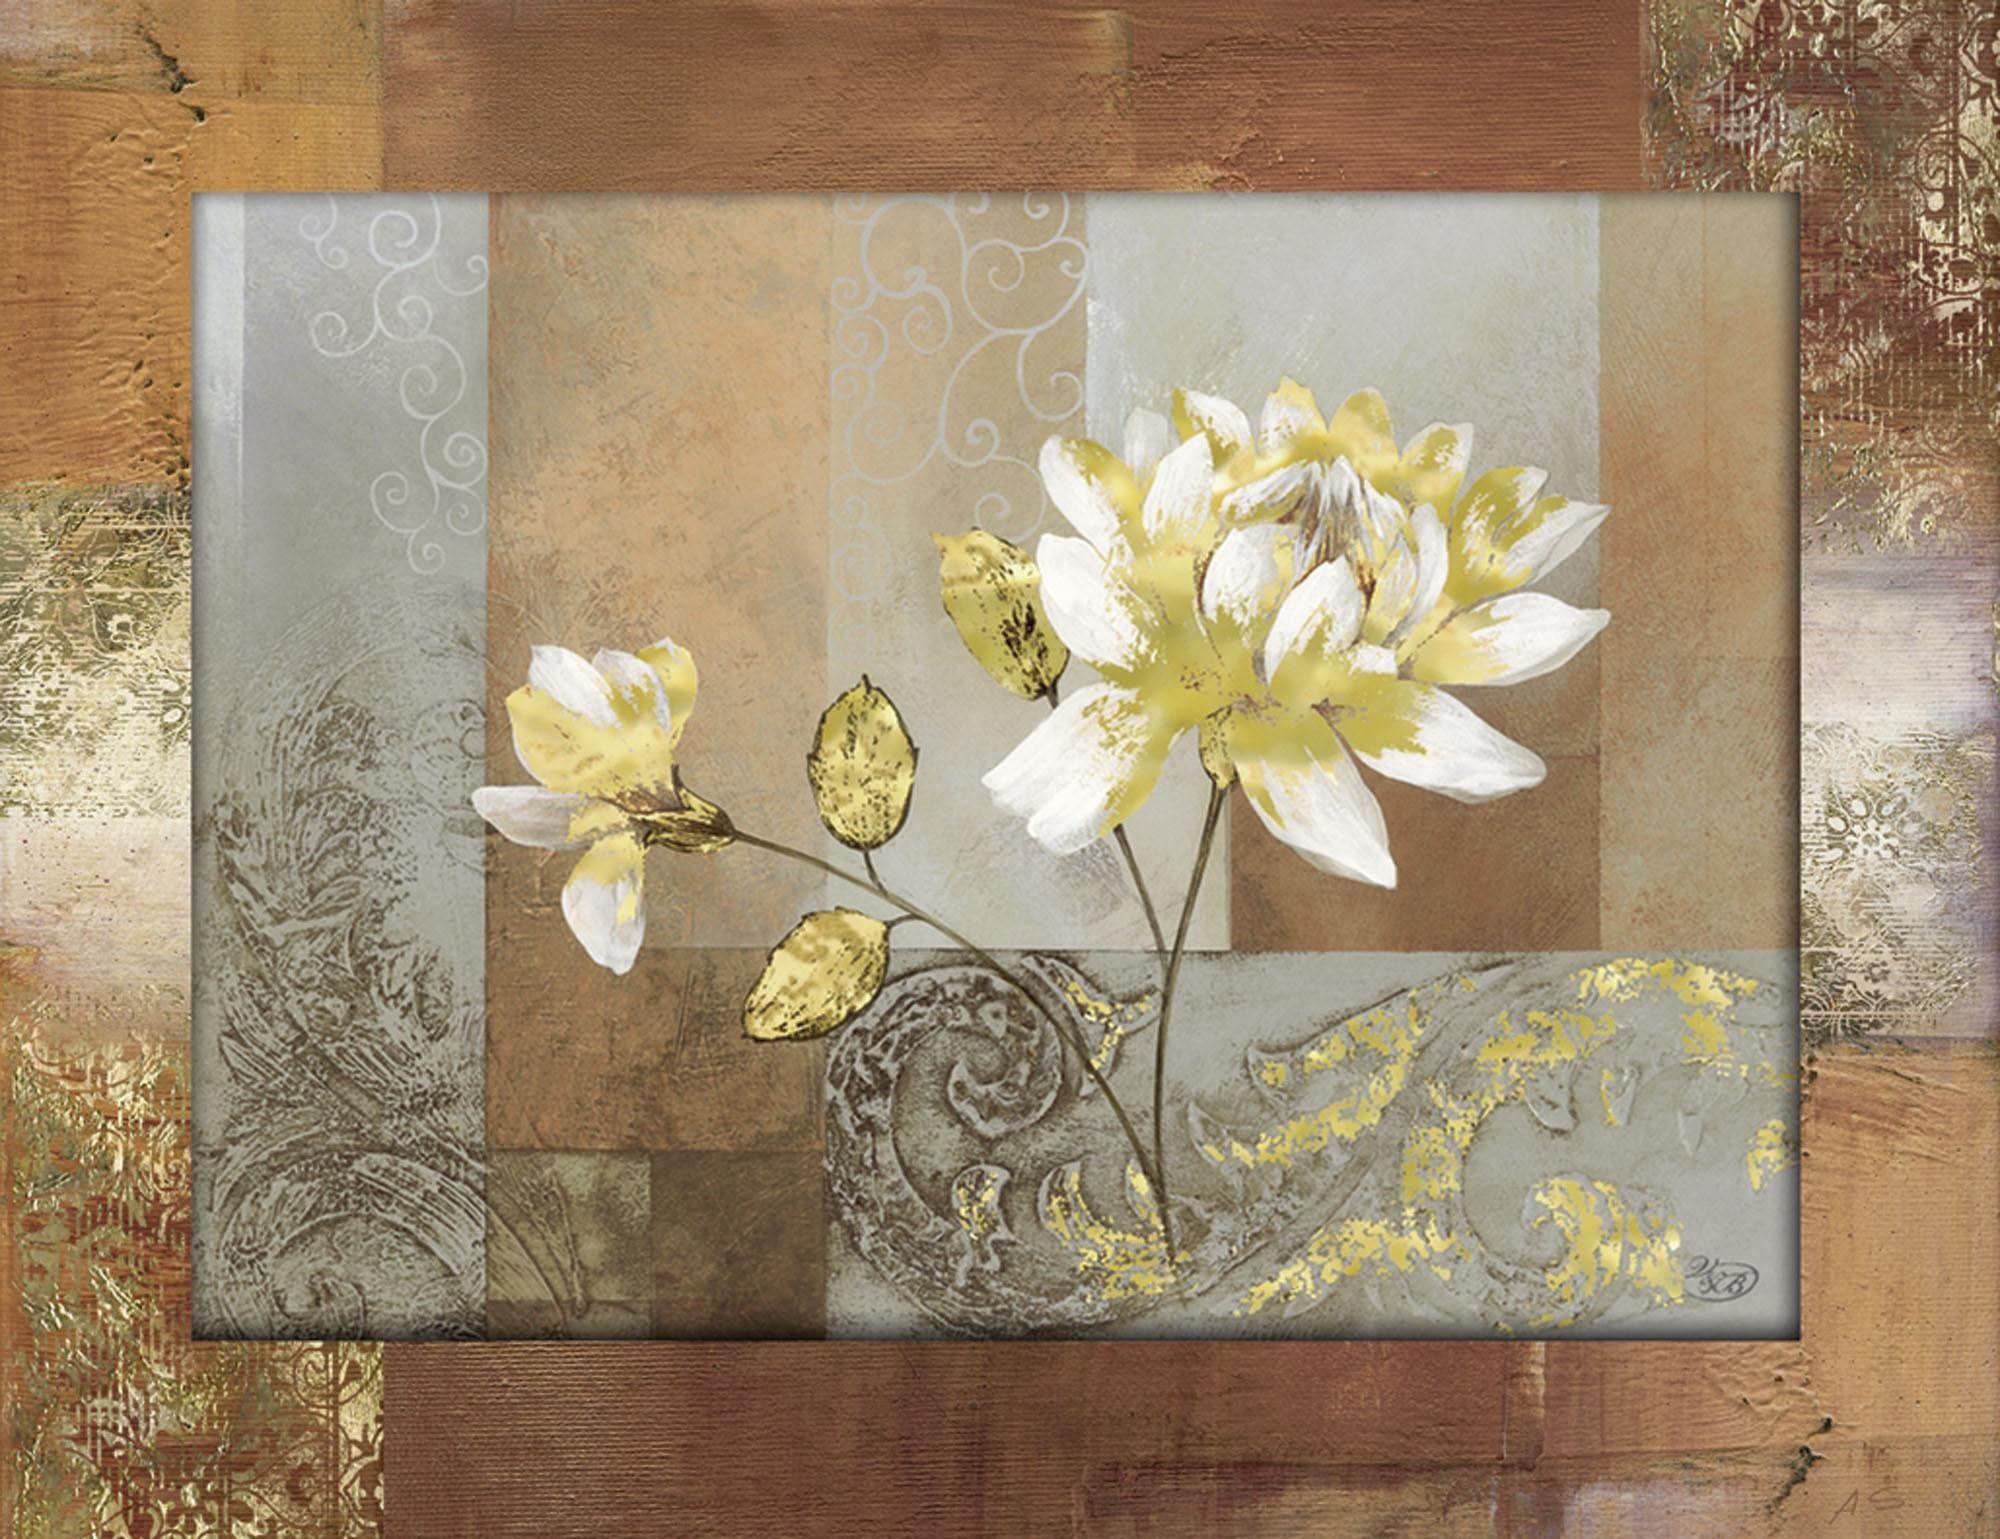 Home affaire Bild »Verbeek&v.d.Broek: Maßloses Aufspr«, Blume, Ornamente, 86,4/66,4 cm, gerahmt